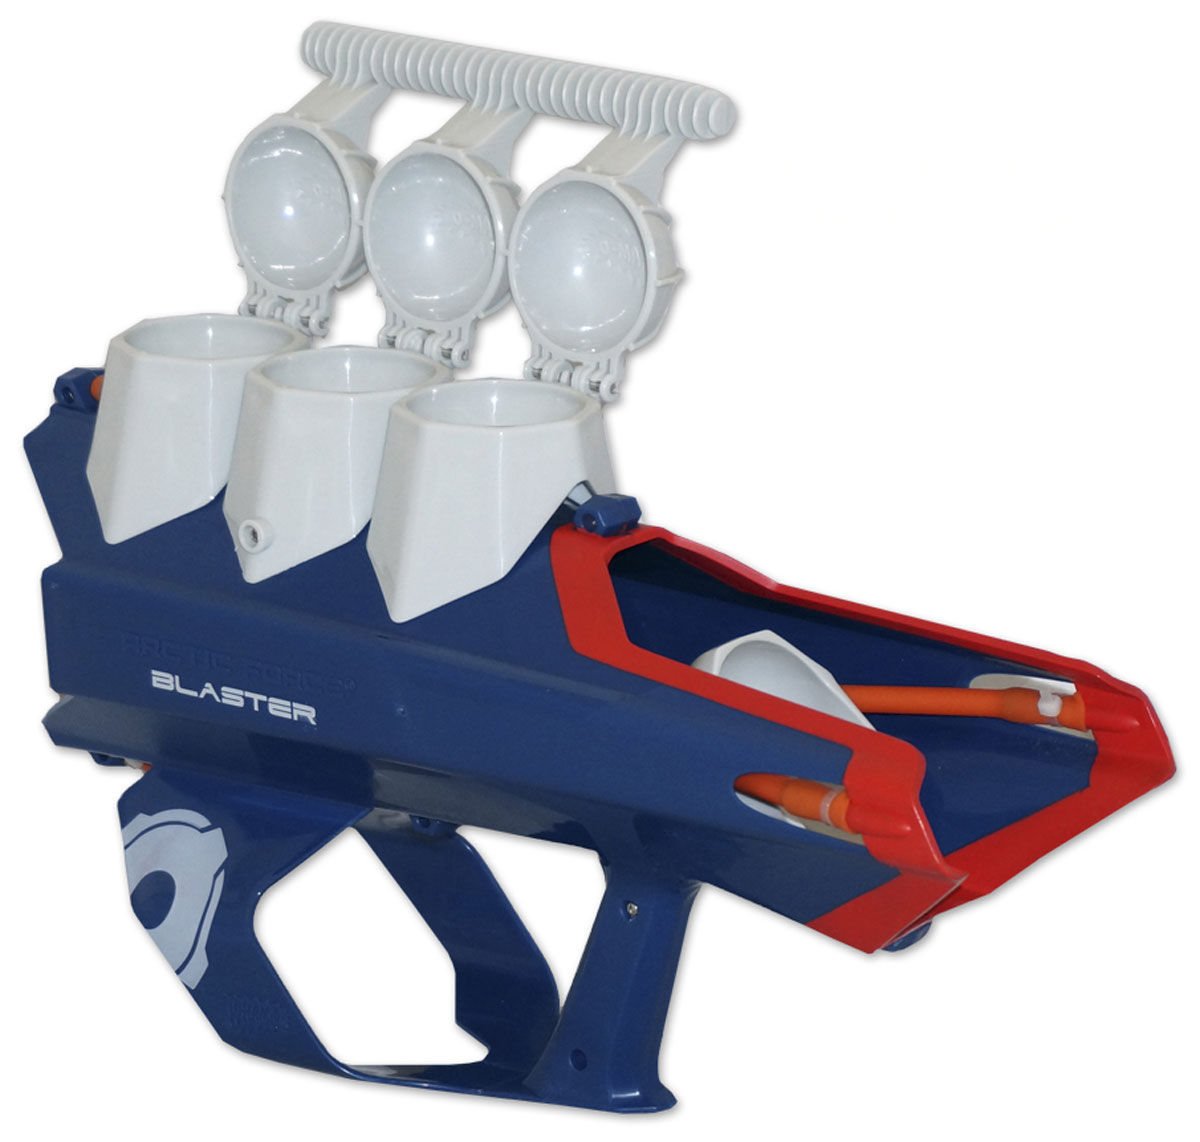 СнежкоБластер Тройной SnowBall Blaster, SB-38135SB38135Вес: 1,090 гРазмеры ДхВхШ: 50*32*14Материал: пластик